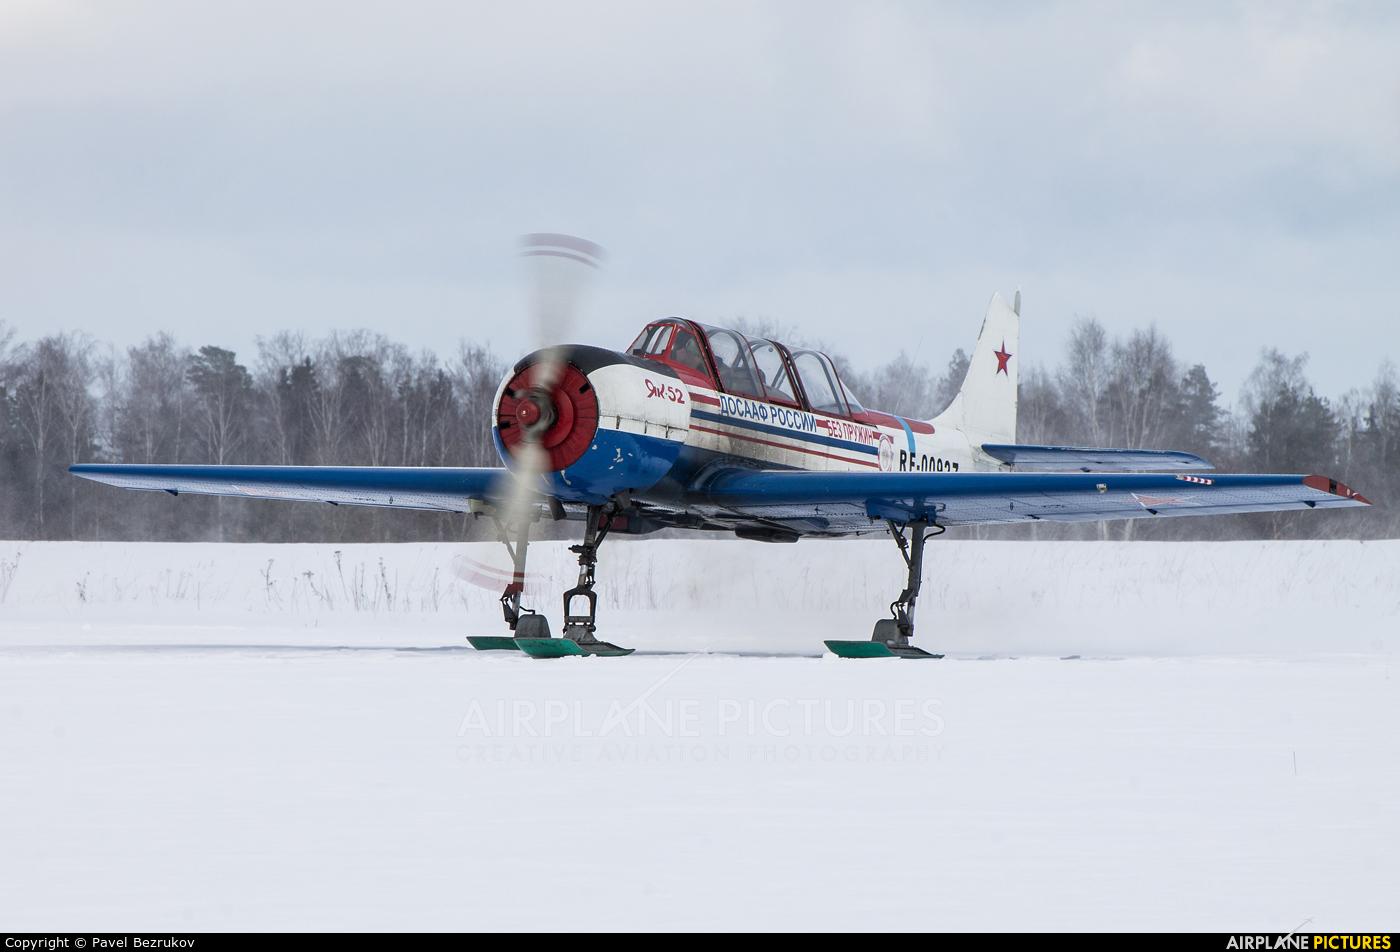 Undisclosed RF-00927 aircraft at Ivanovo - Yasunikha